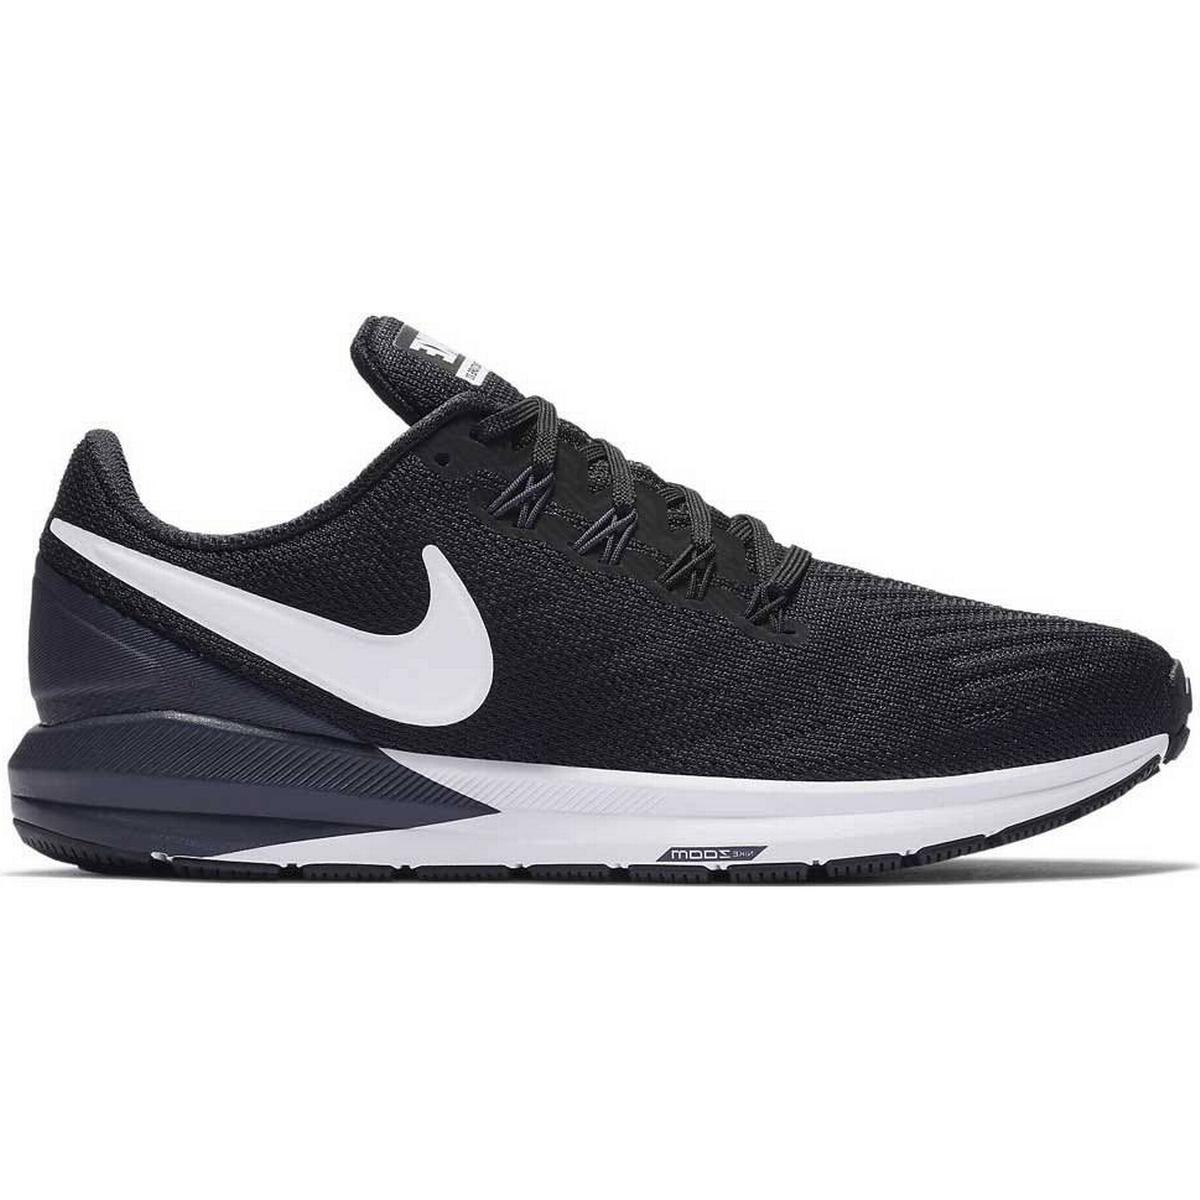 Köp nu Dam Nike Air Max 90 Svart Svart dark Armory Blå